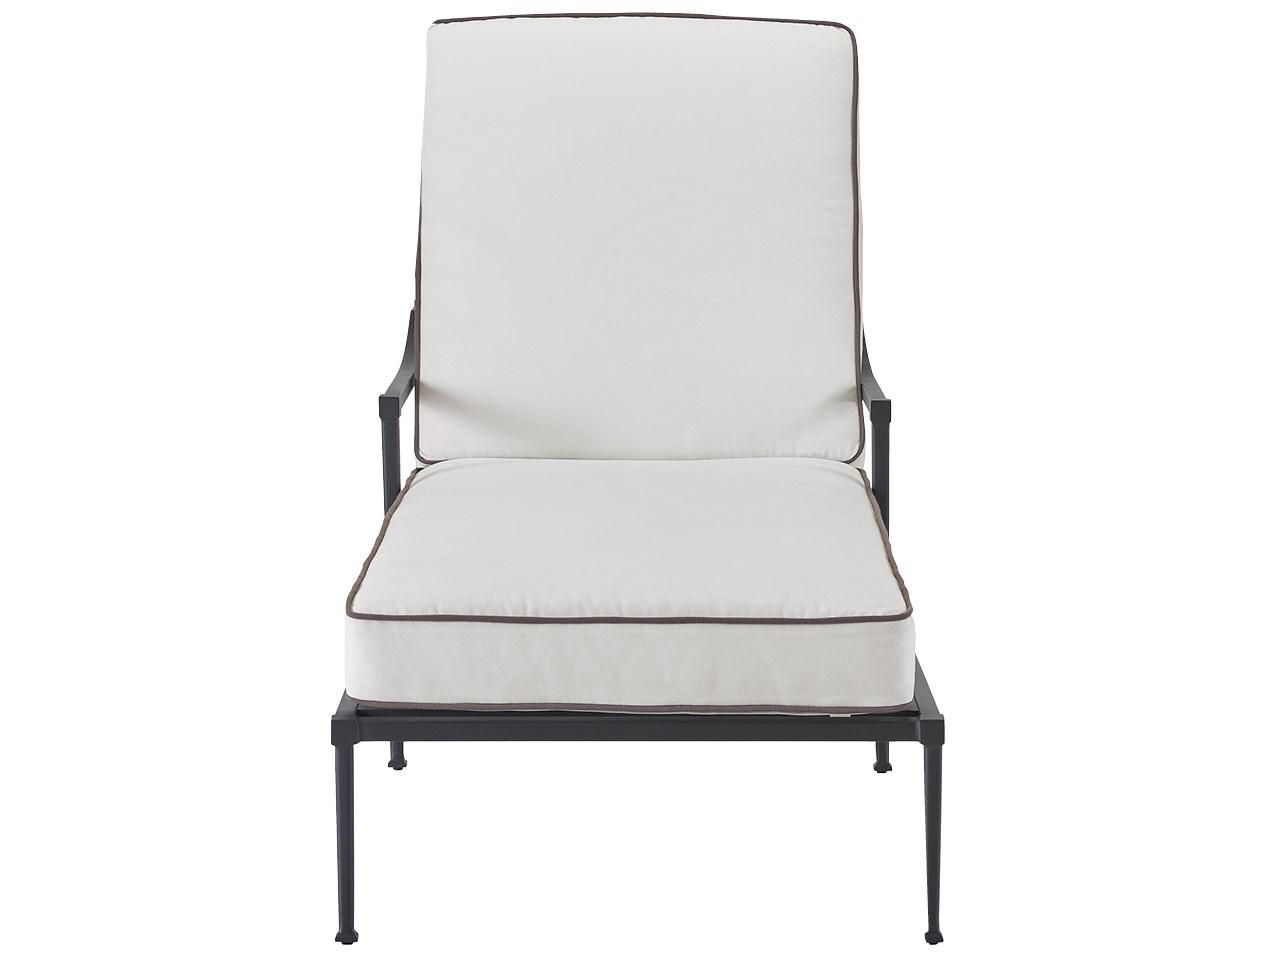 Seneca Chaise Lounge